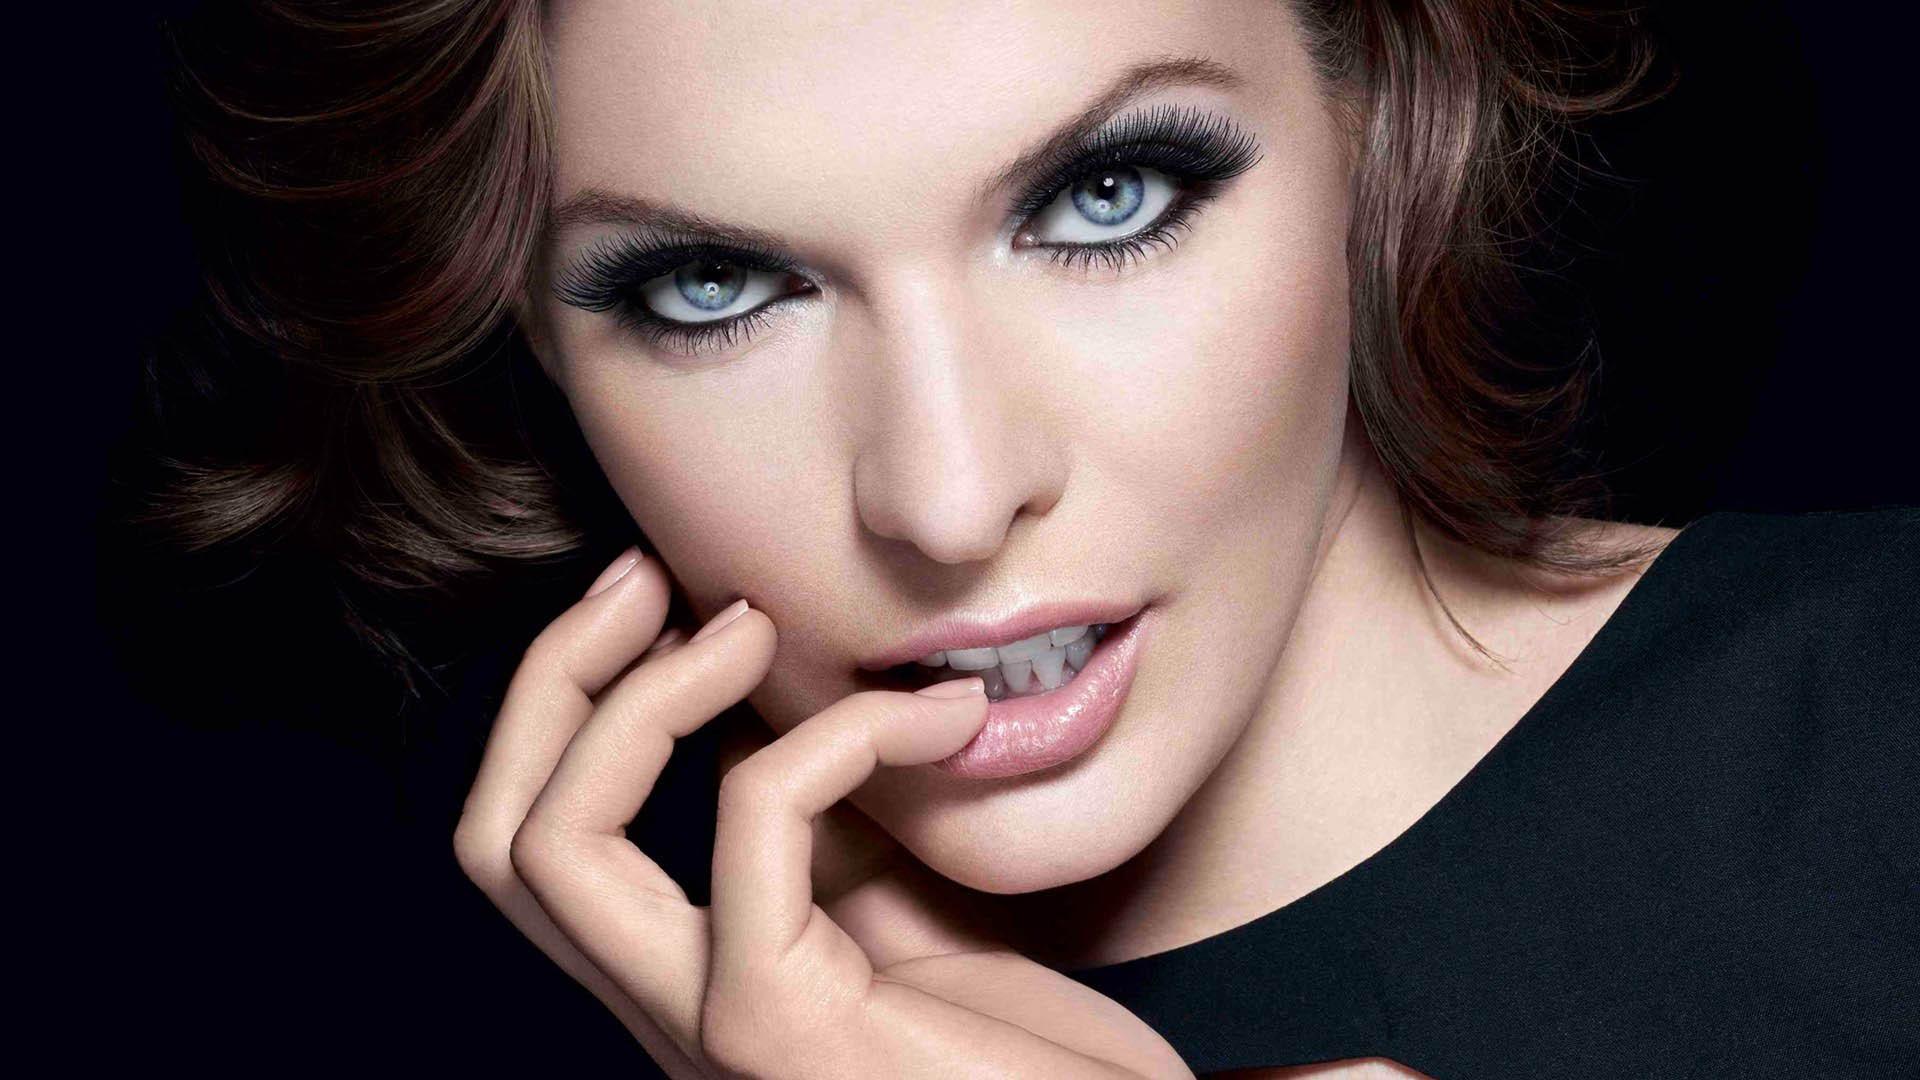 Milla Jovovich Makeup